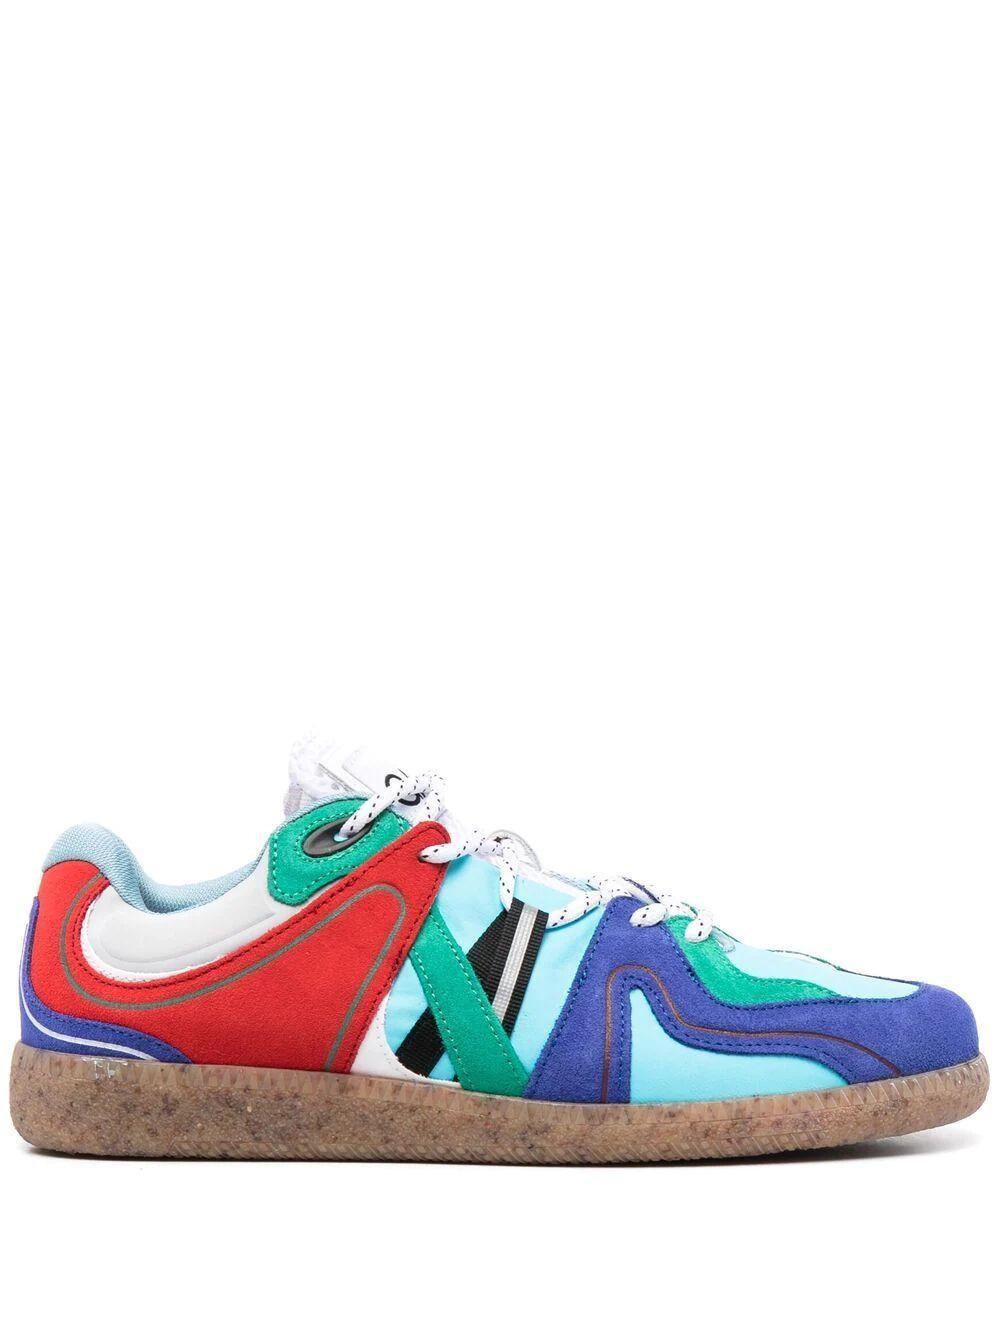 Sport Mix Sneaker Item # S1498